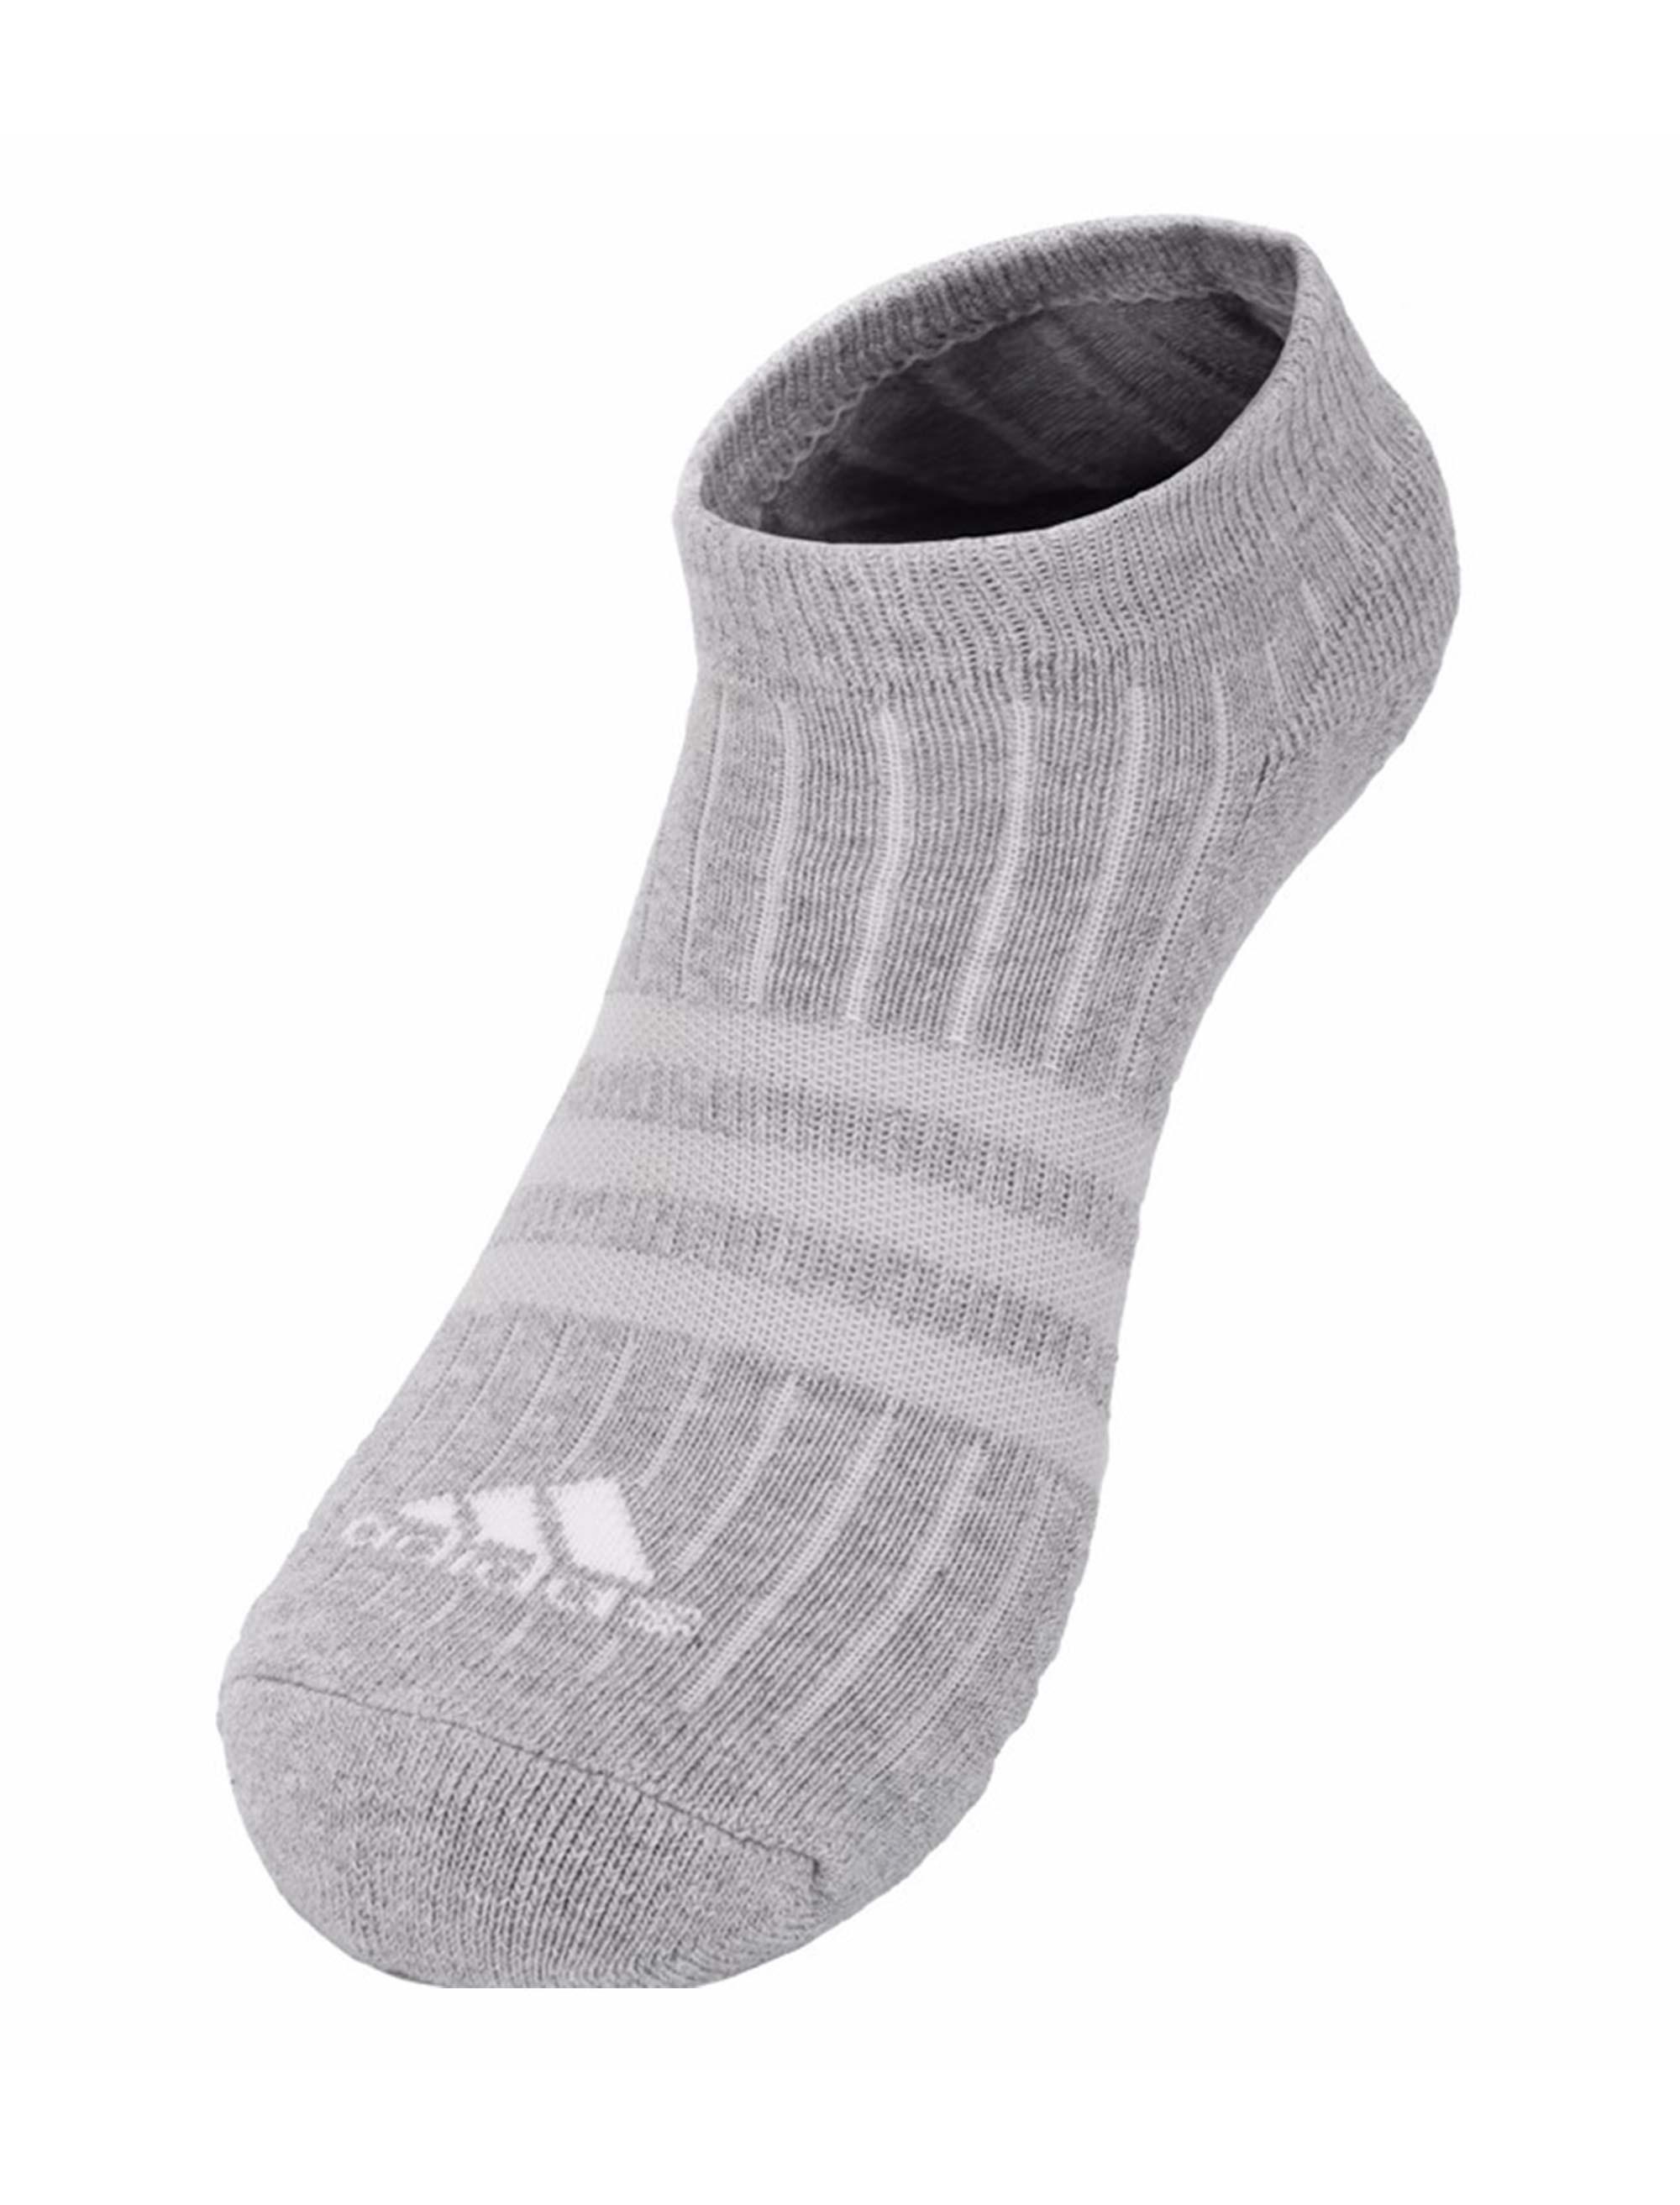 جوراب نخی بدون ساق بزرگسال بسته 3 عددی - آدیداس - طوسي/مشکي/سفيد - 3